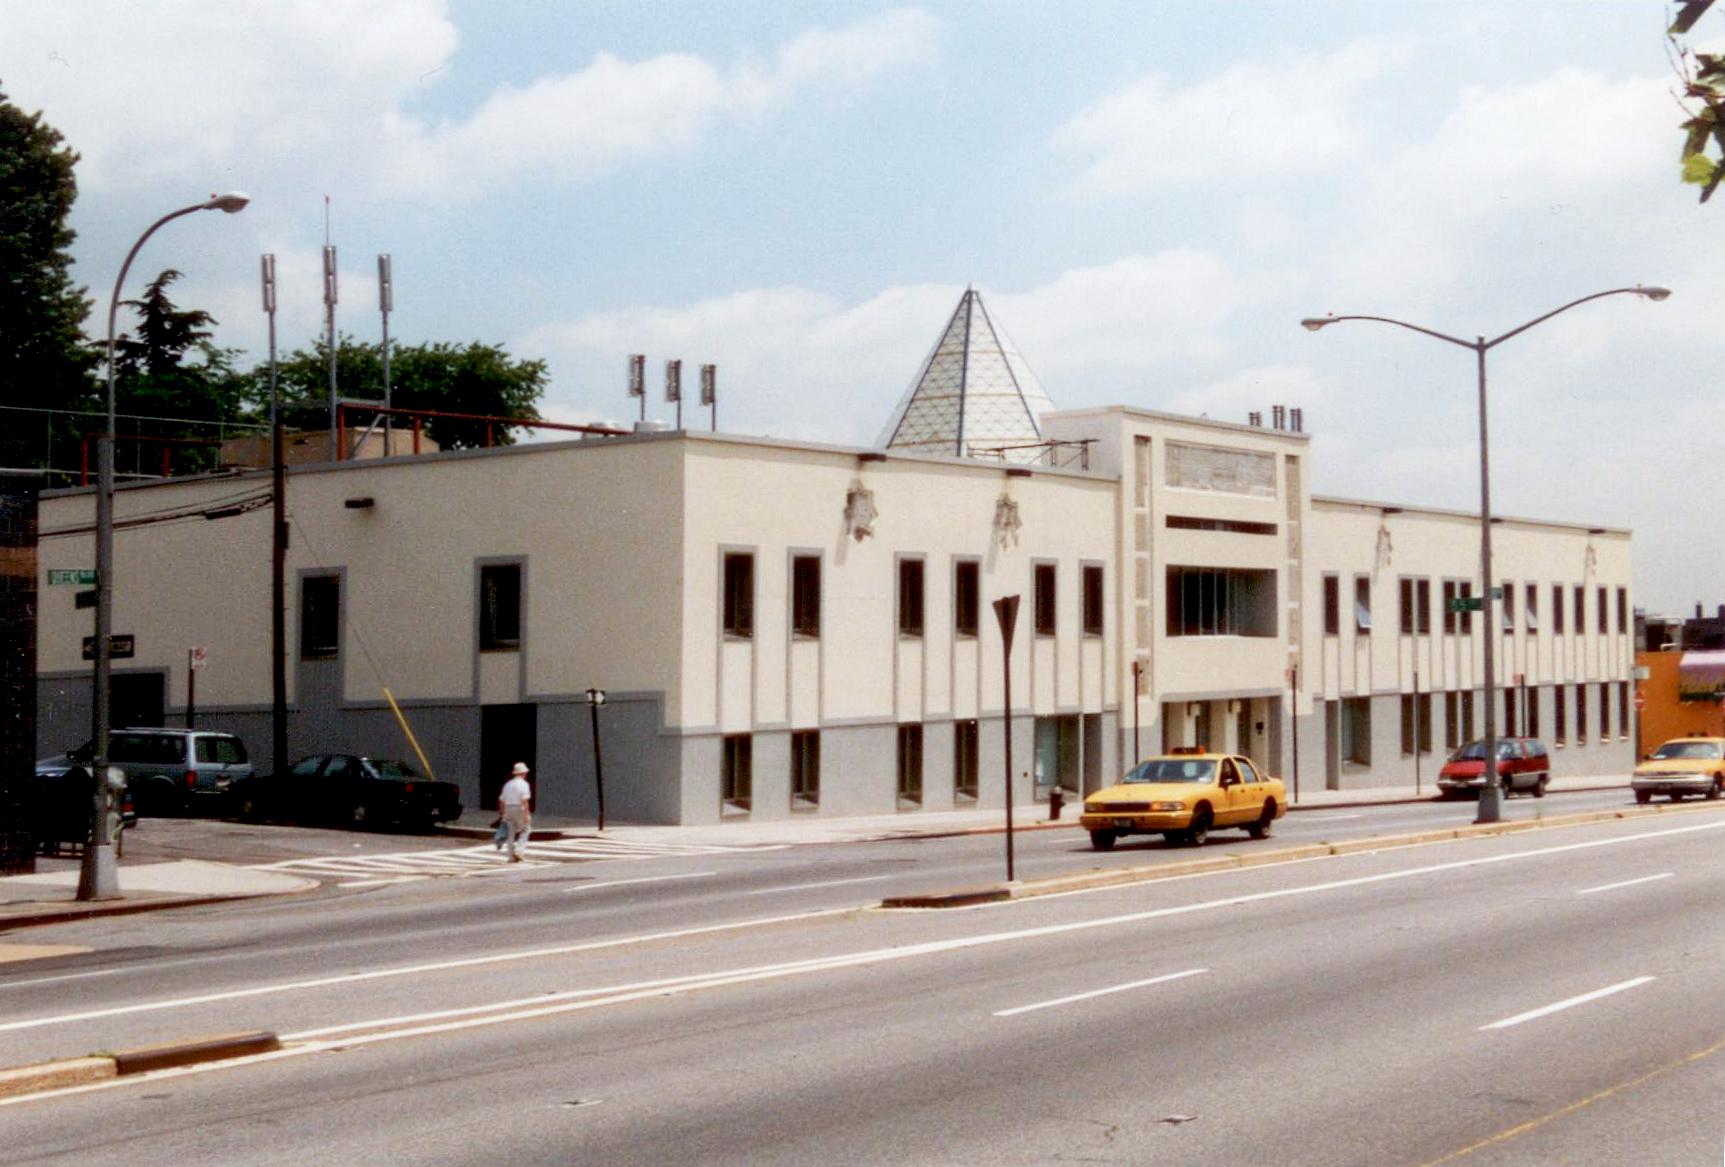 Razi School & Mosque, Queens, NY